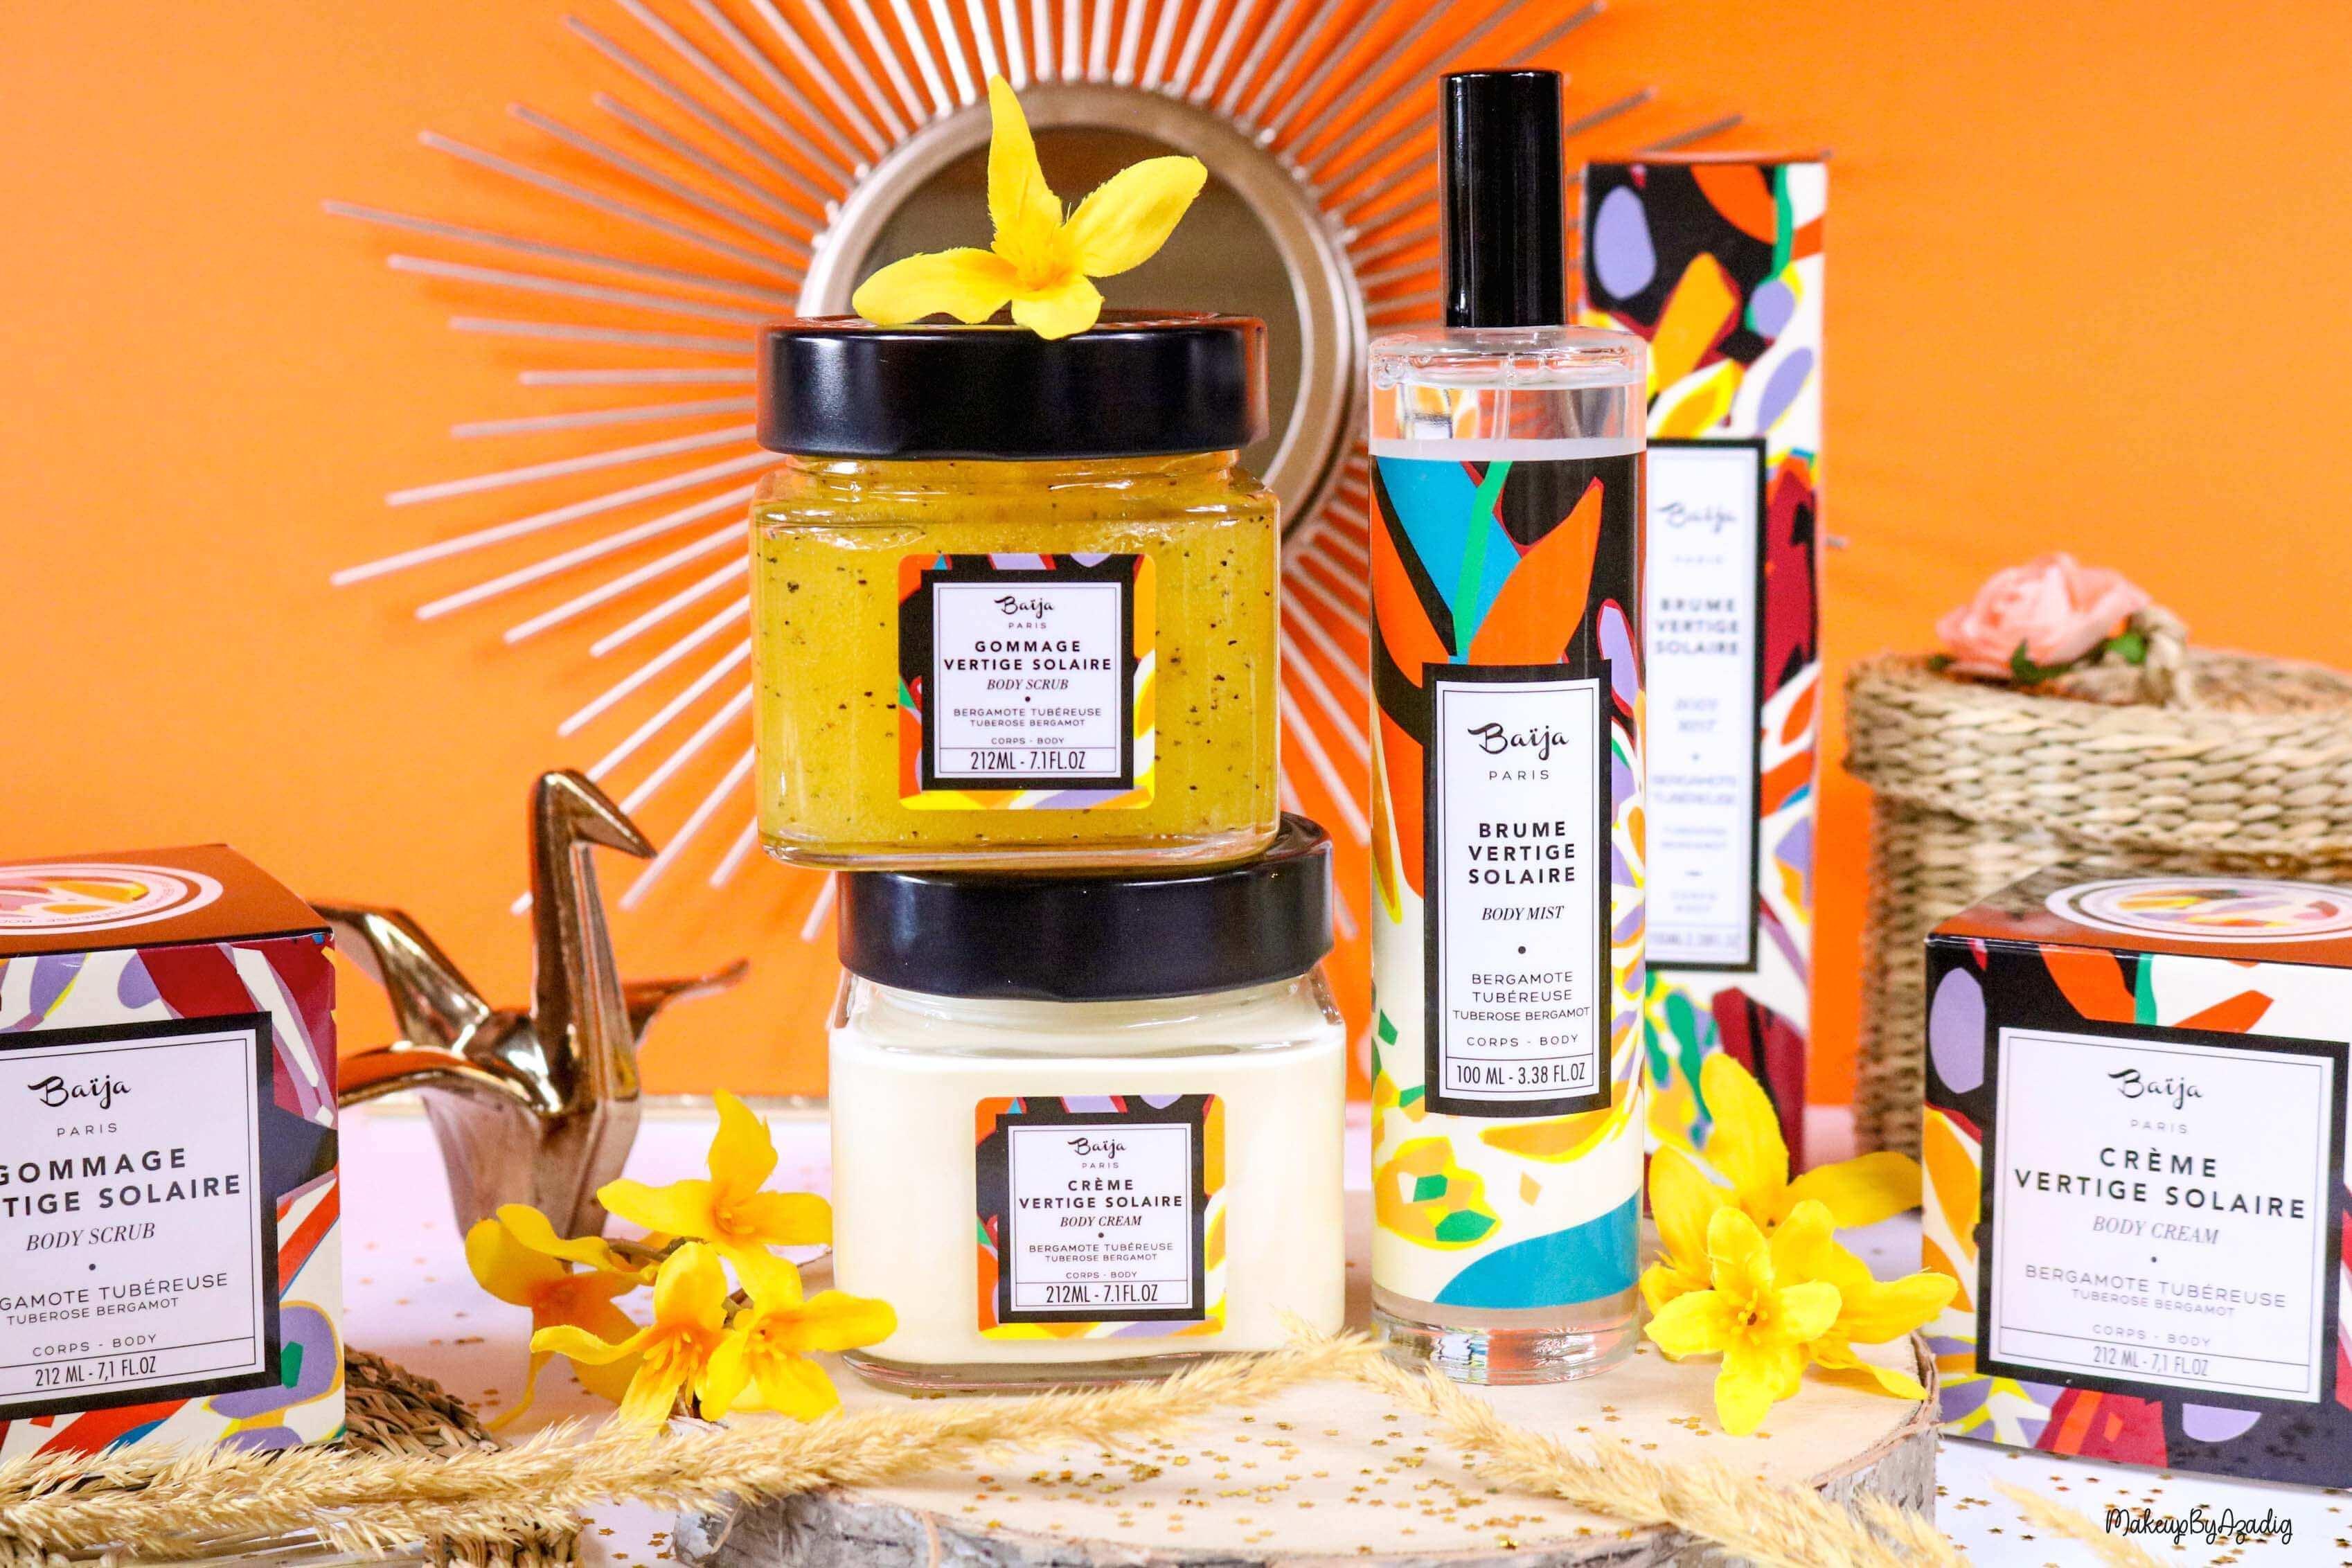 nouveaute-soin-baija-vertige-solaire-sephora-promo-code-gommage-creme-corps-brume-avis-prix-makeupbyazadig-qualite-miniature